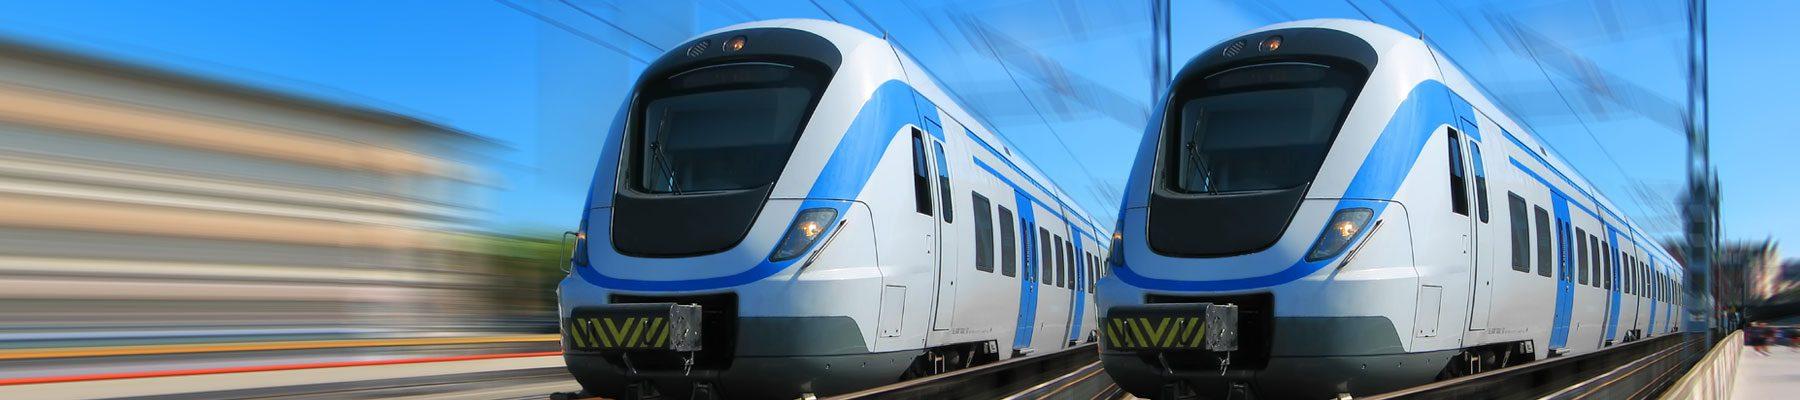 Nylacast Road Rail & Transport Industry